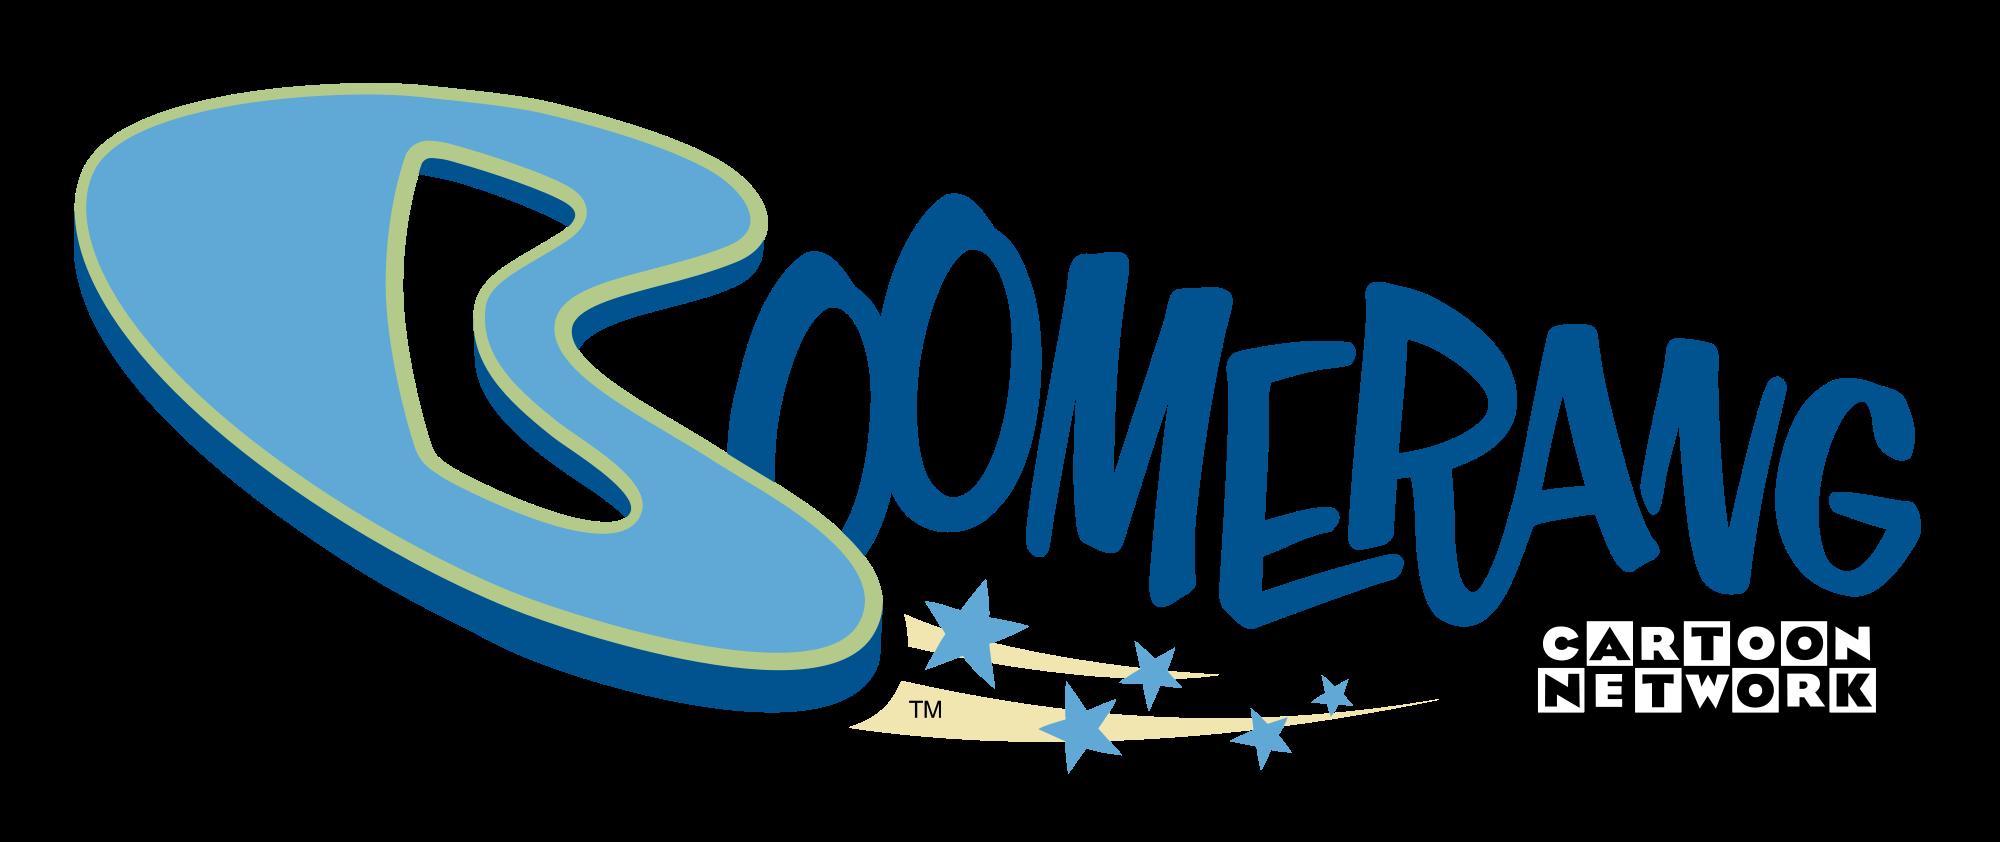 Boomerang the cartoon network wiki fandom powered by wikia